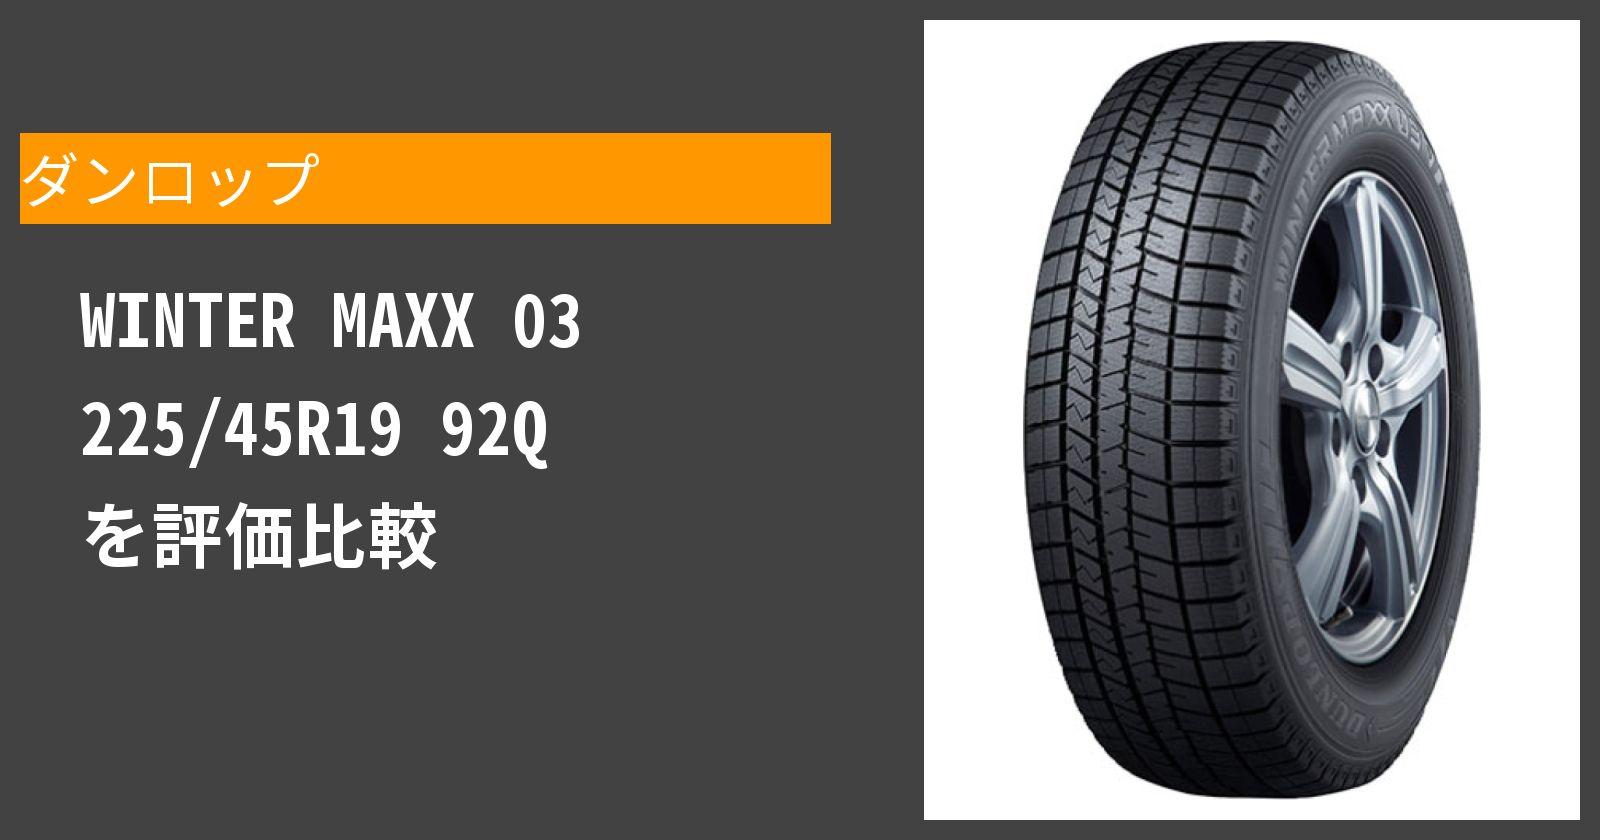 WINTER MAXX 03 225/45R19 92Qを徹底評価